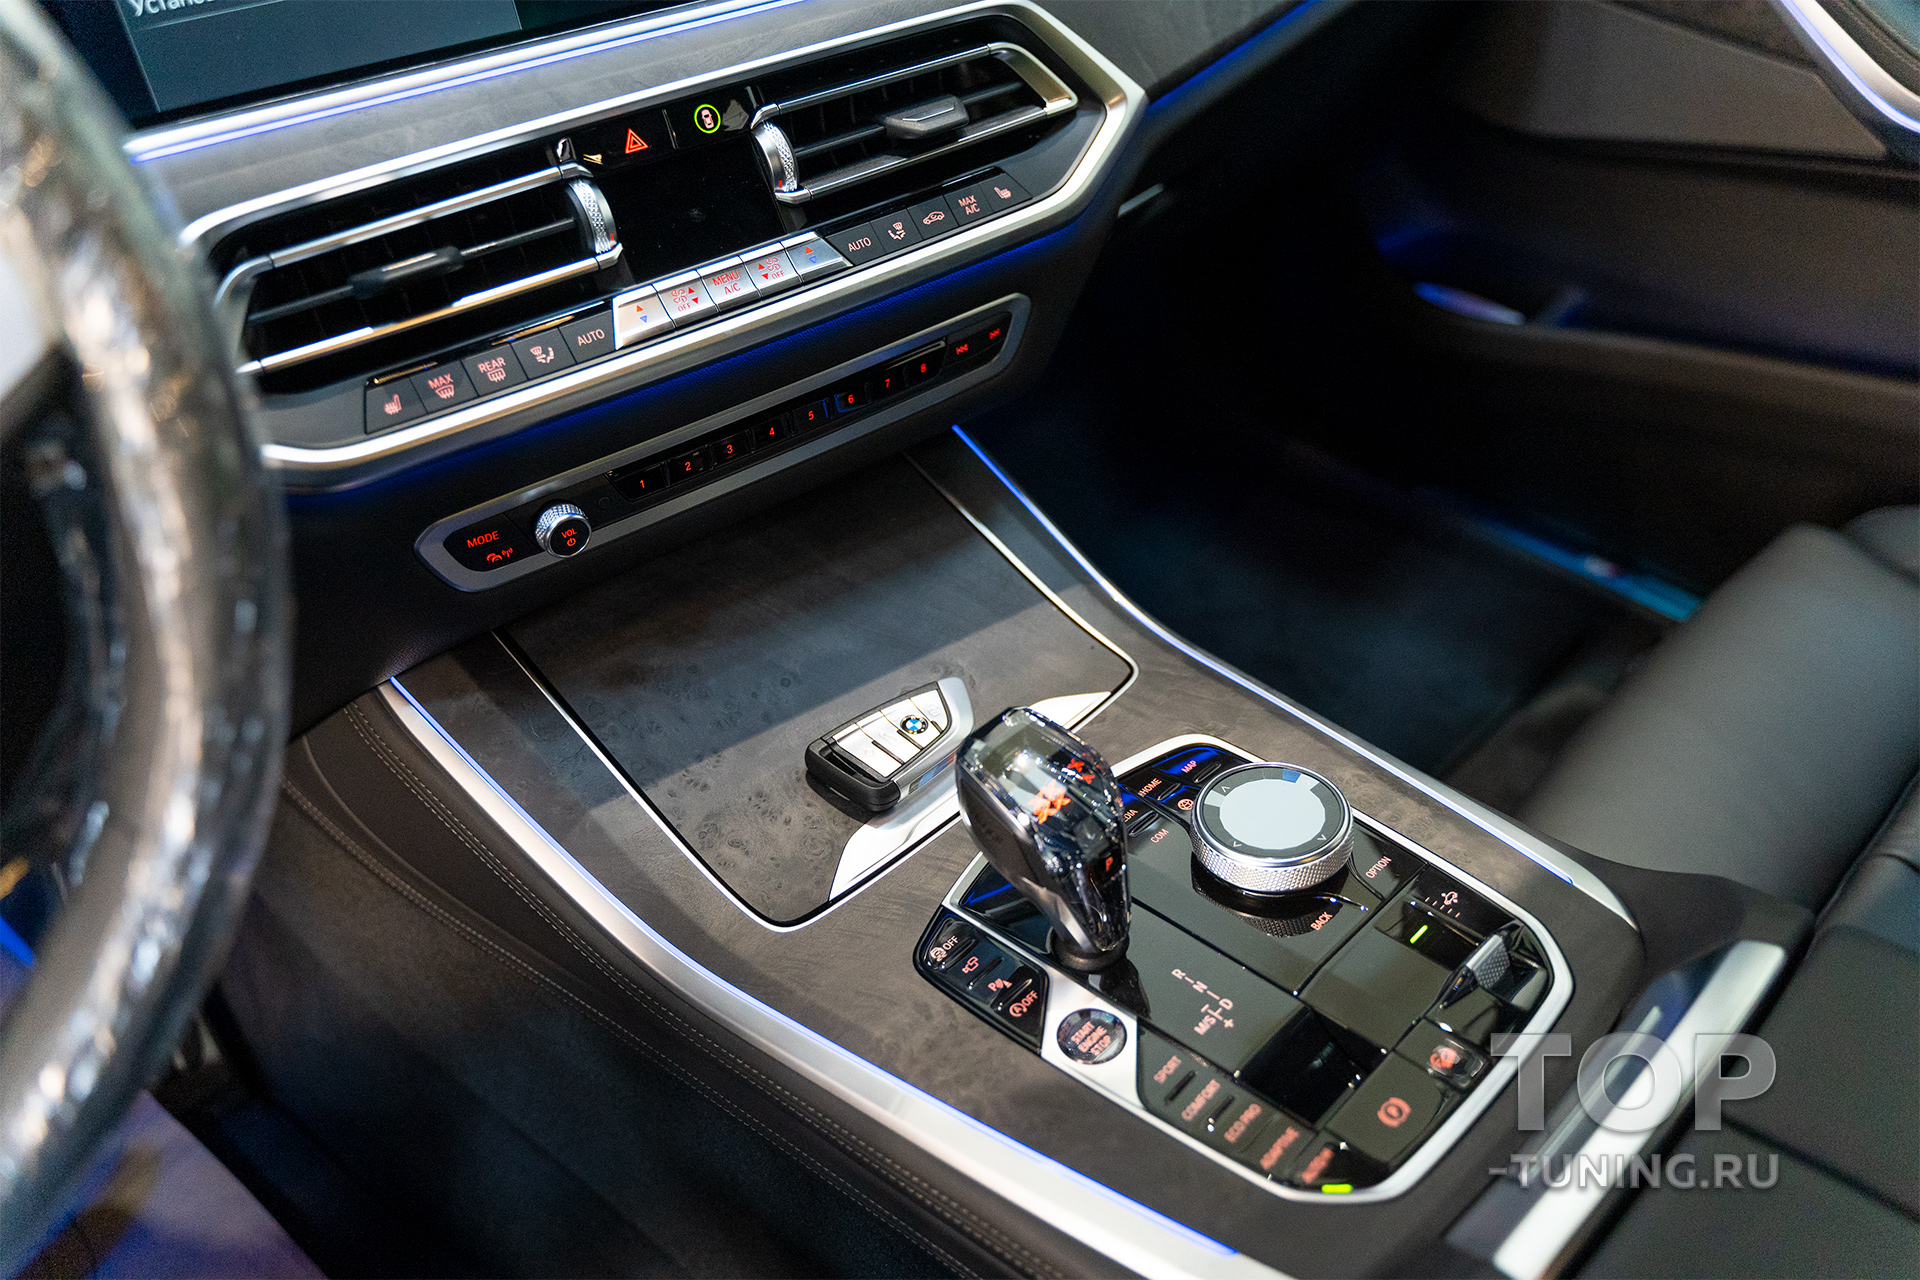 10076 Хрустальная консоль iDRIVE для BMW 8 / X5 / X6 / X7